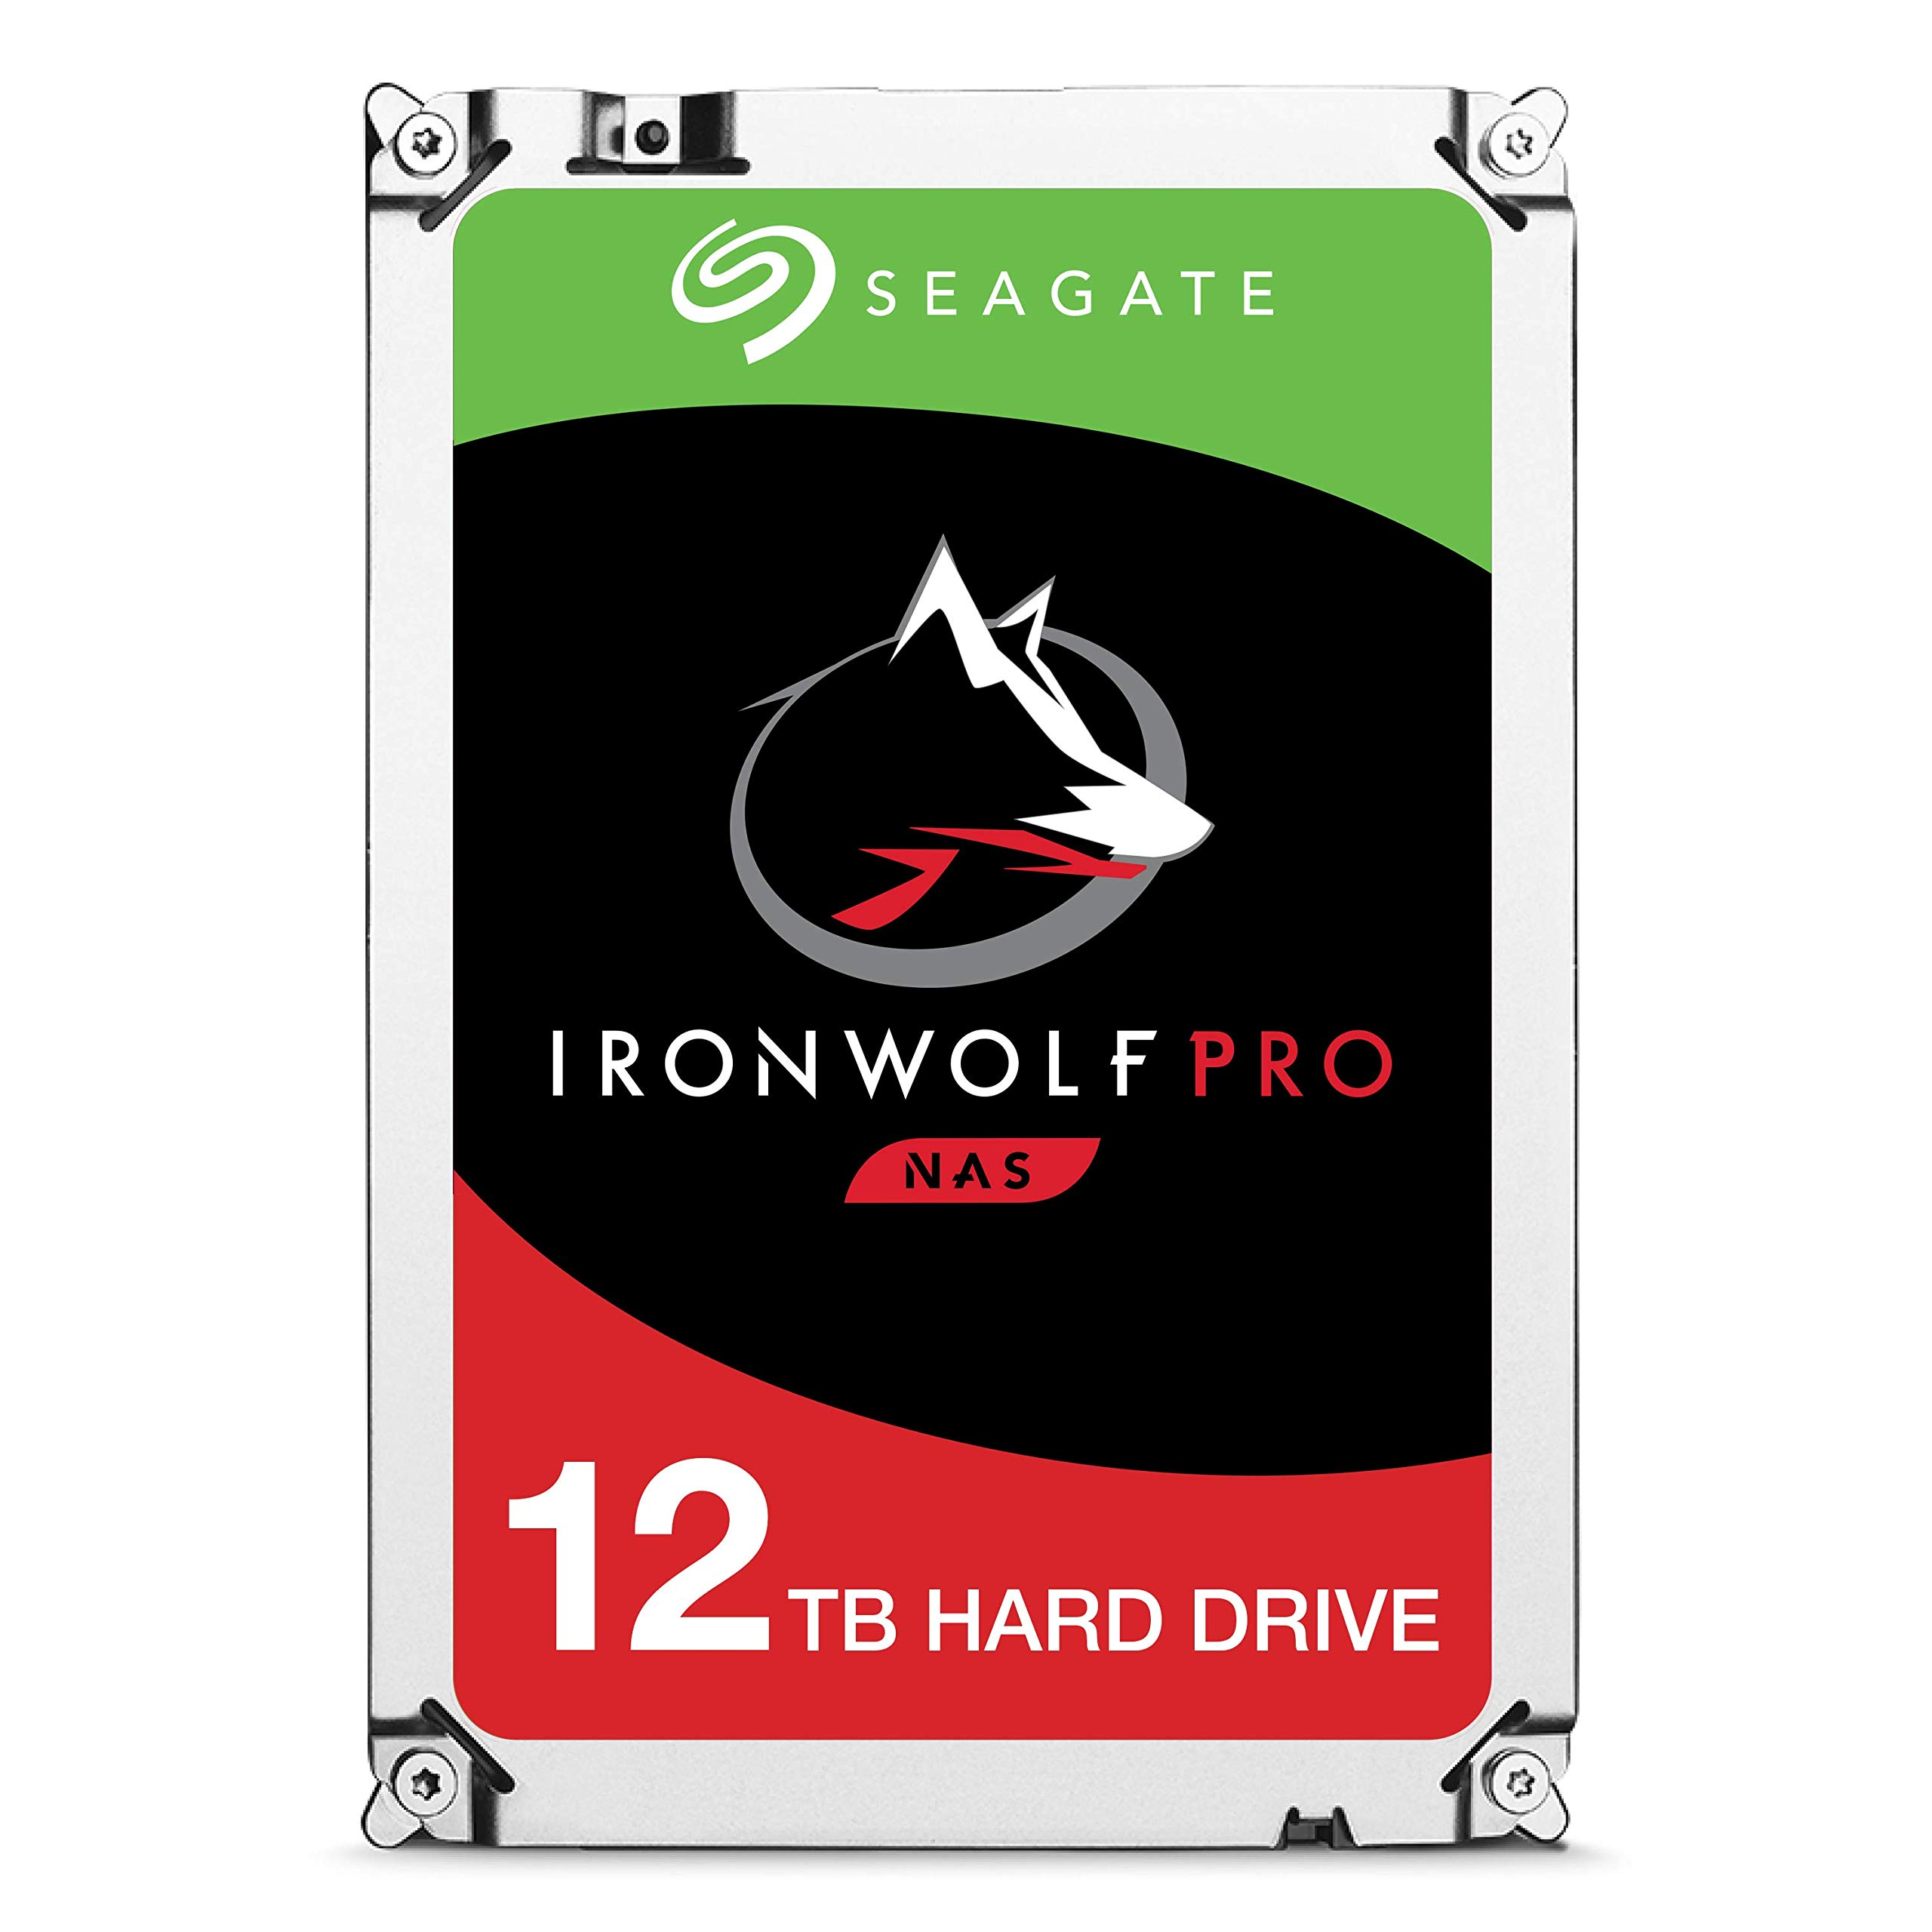 Seagate IronWolf Pro 12 TB NAS RAID Internal Hard Drive - 7,200 RPM SATA 6 Gb/s 3.5-inch - Frustration Free Packaging (ST12000NE0007)